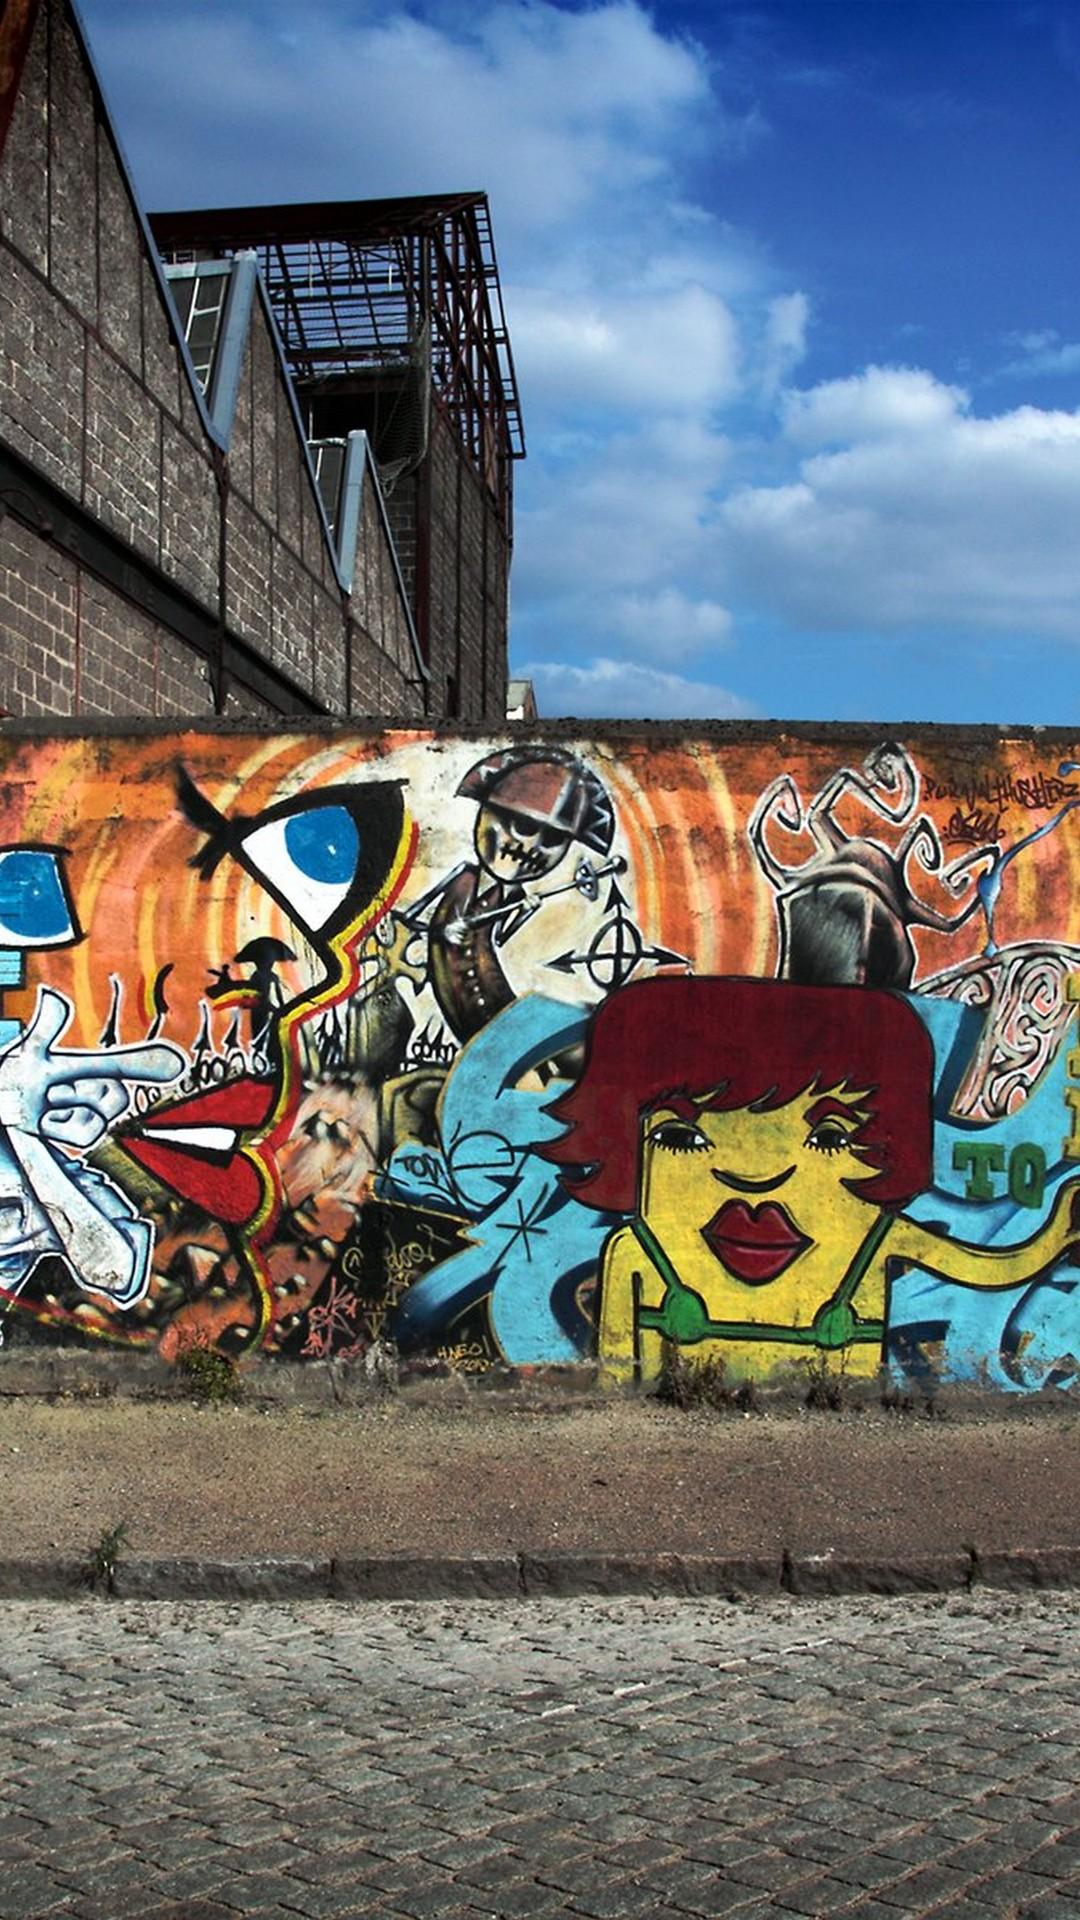 HD Street Art Wallpaper